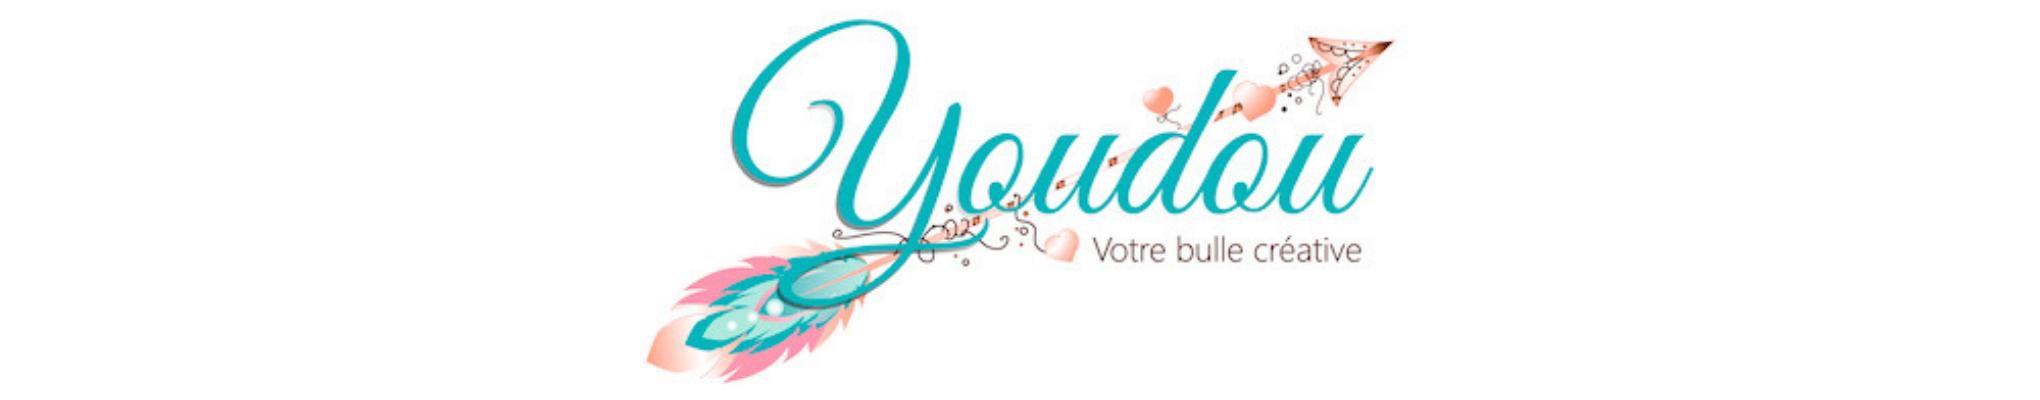 Youdou